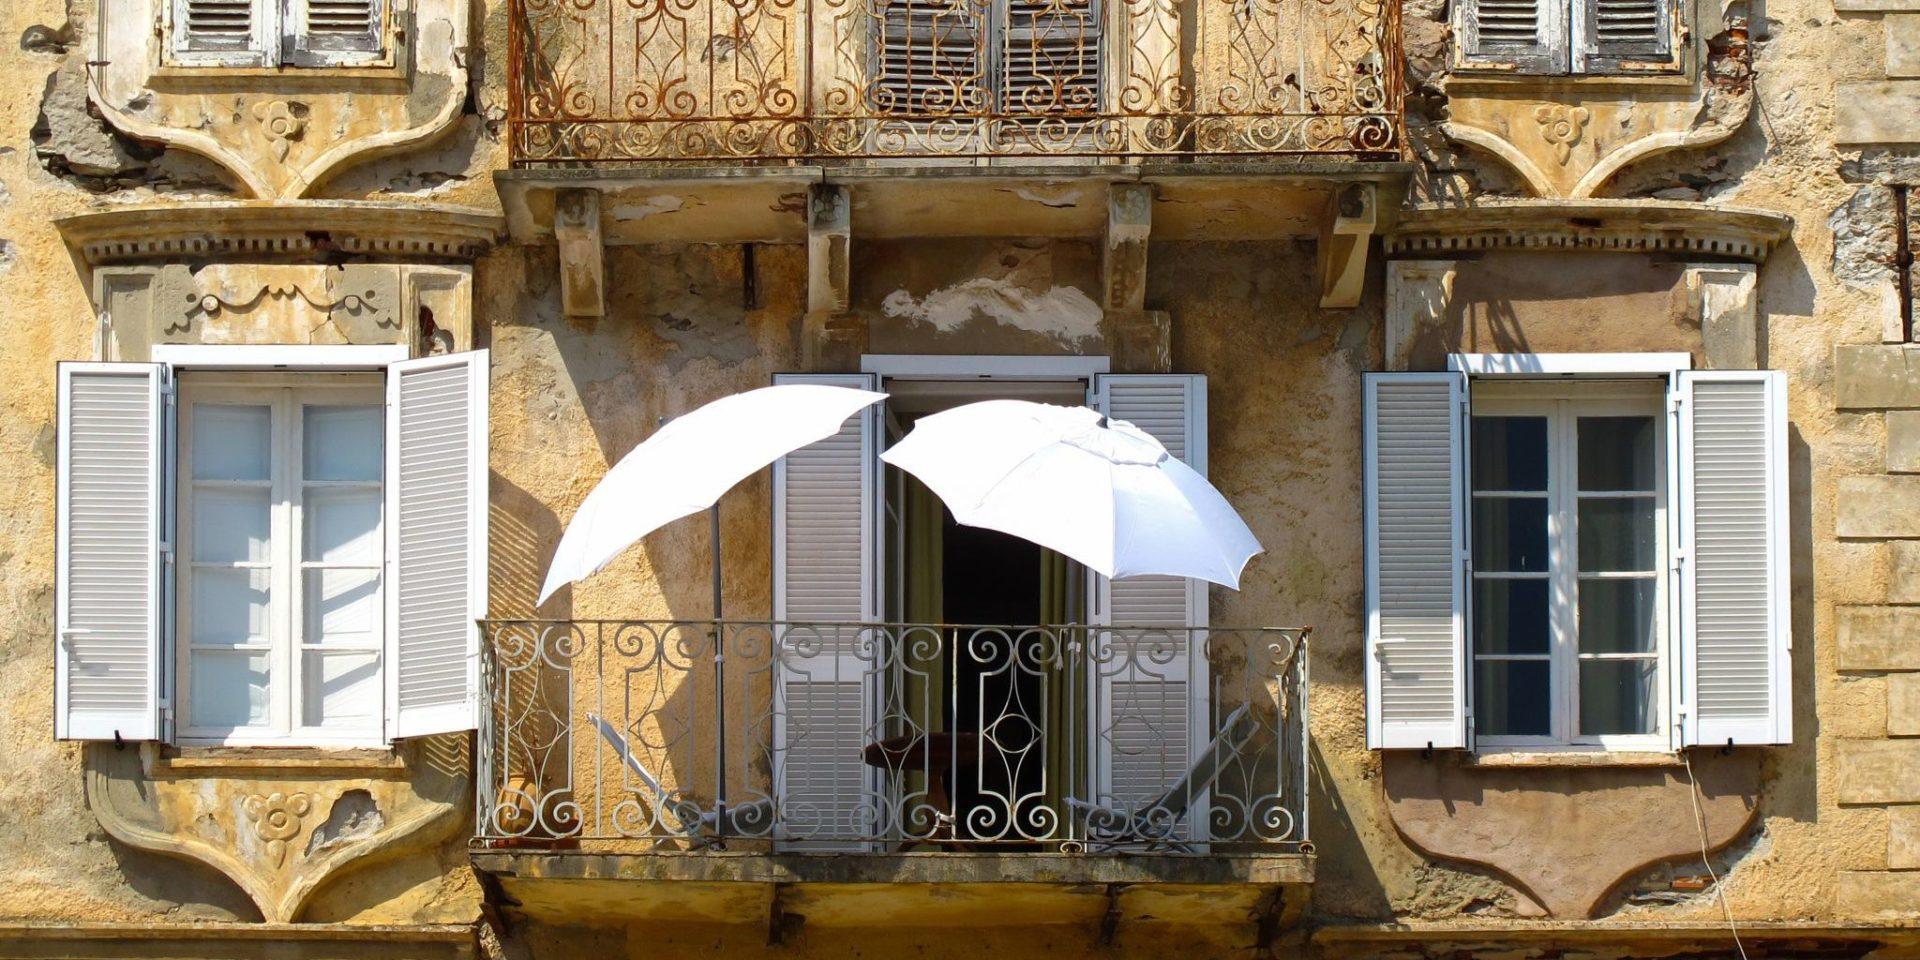 Hotel Castel Brando Erbalunga Cap Corse Corsica Frankrijk Erbalunga huis balkon smeedwerk